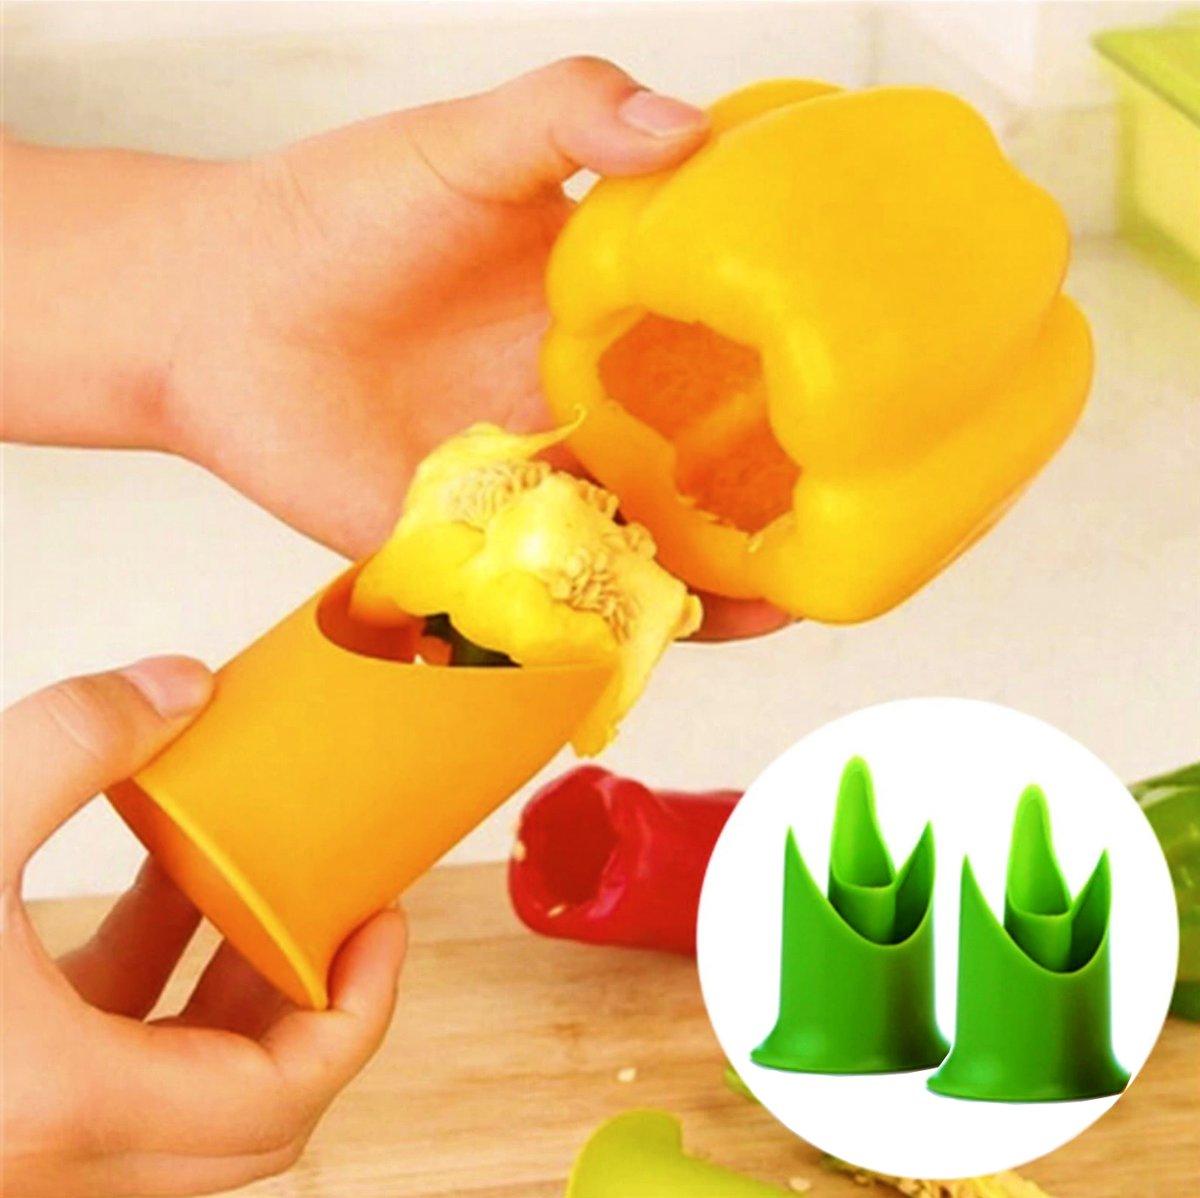 Paprika ontpitter van Recette Parfait - Makkelijk gevulde paprika maken - Groen - Paprika Tool - Puntpaprika - Remove pepper seeds - Keukenaccessoires - Paprika zaadjes - Groenten - Biologische paprika ontpitten kopen